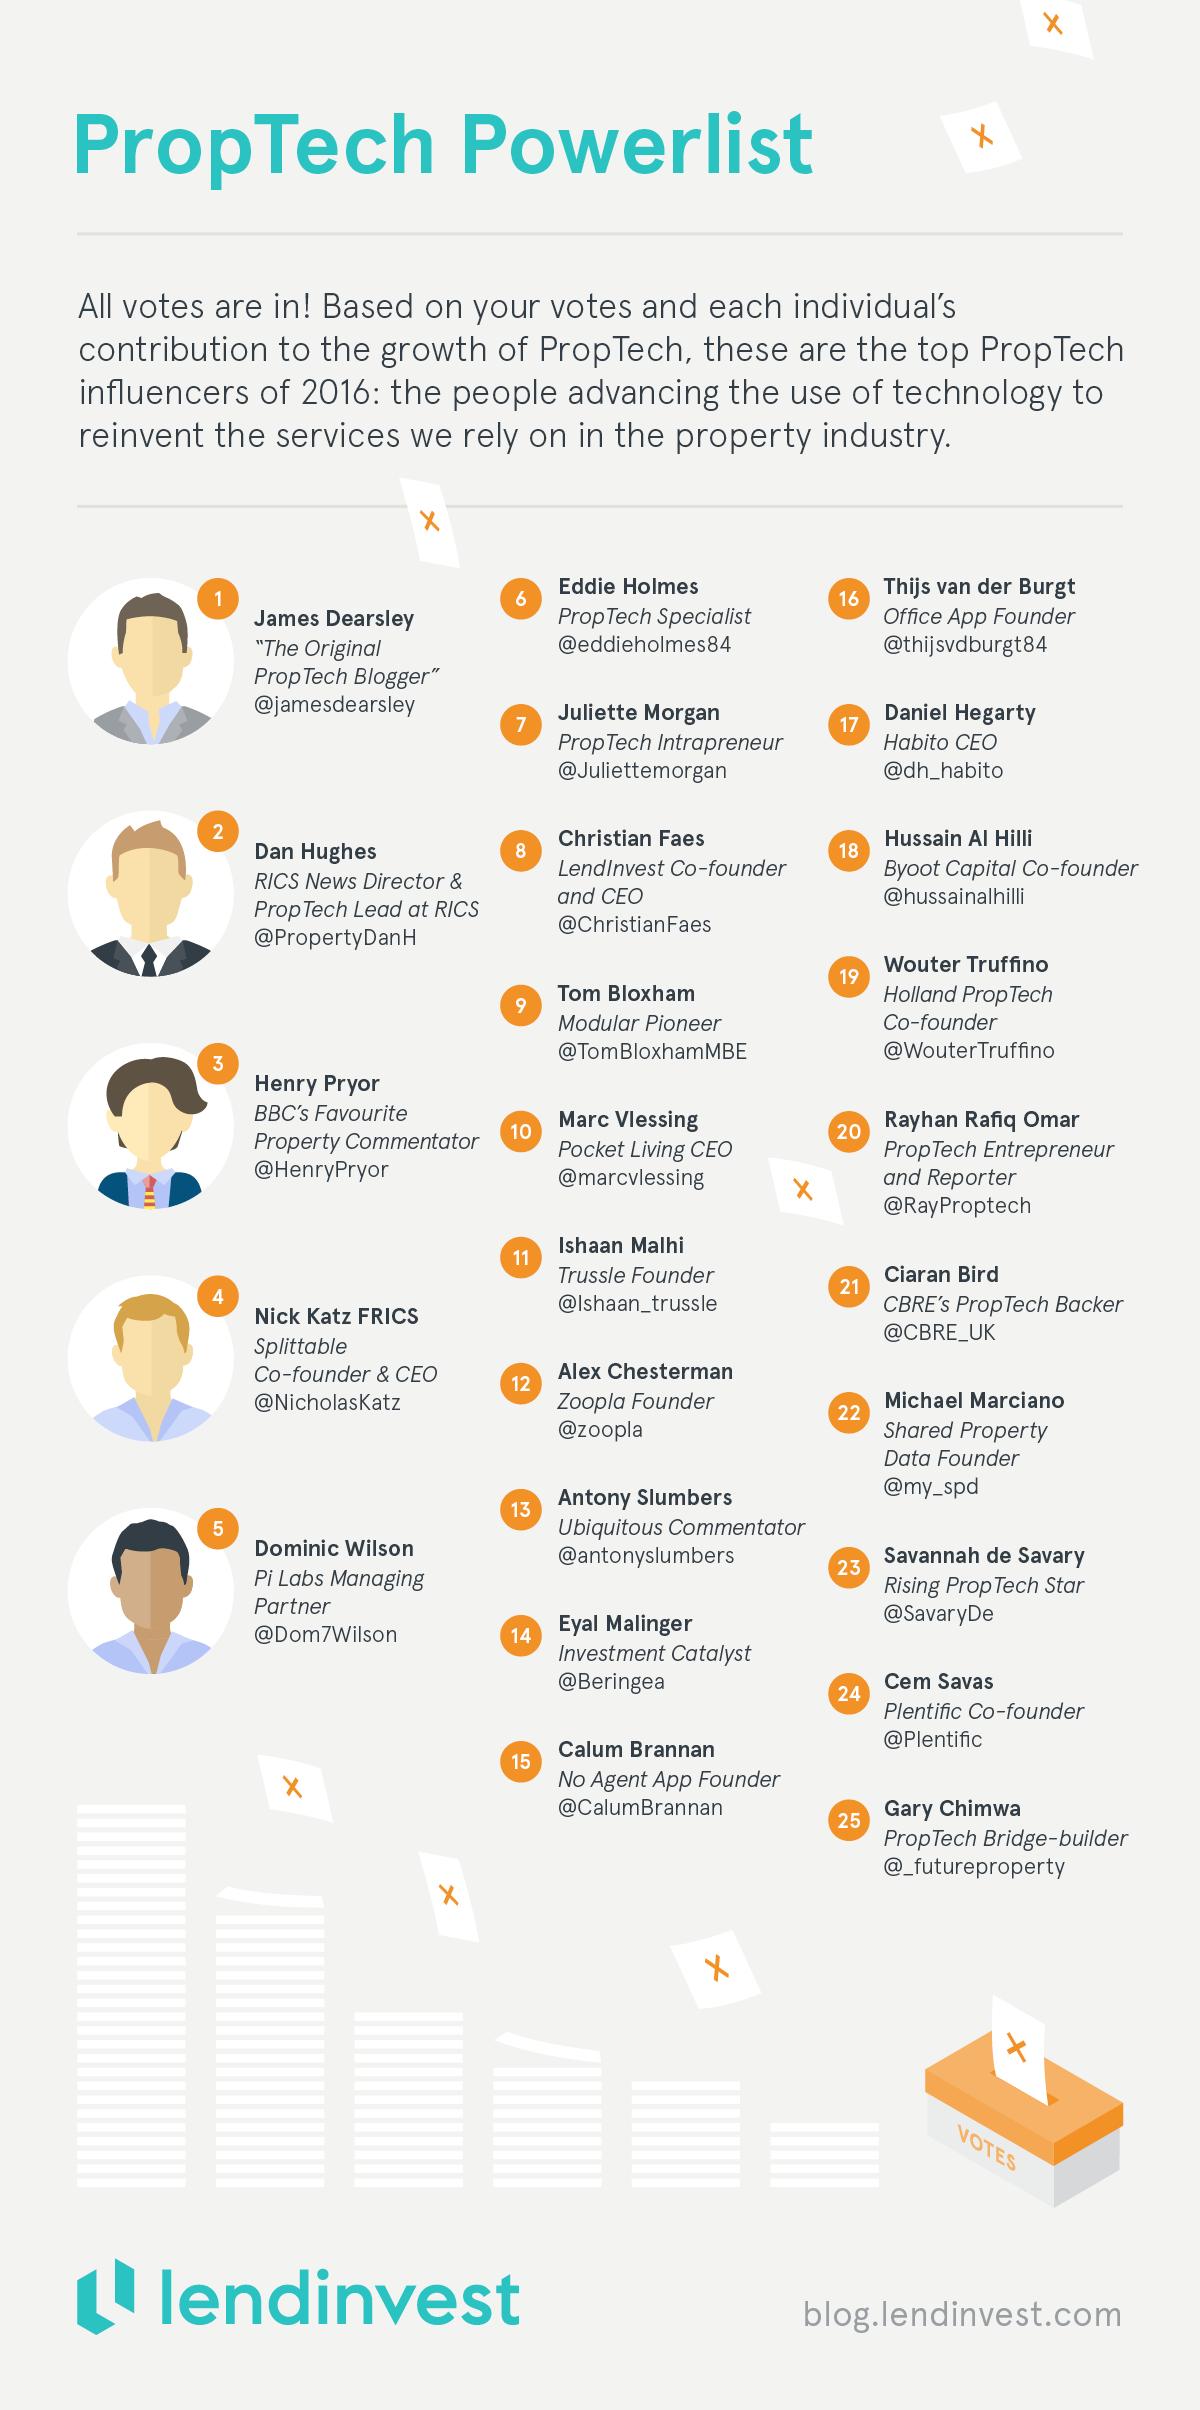 proptech-influencer-profiles